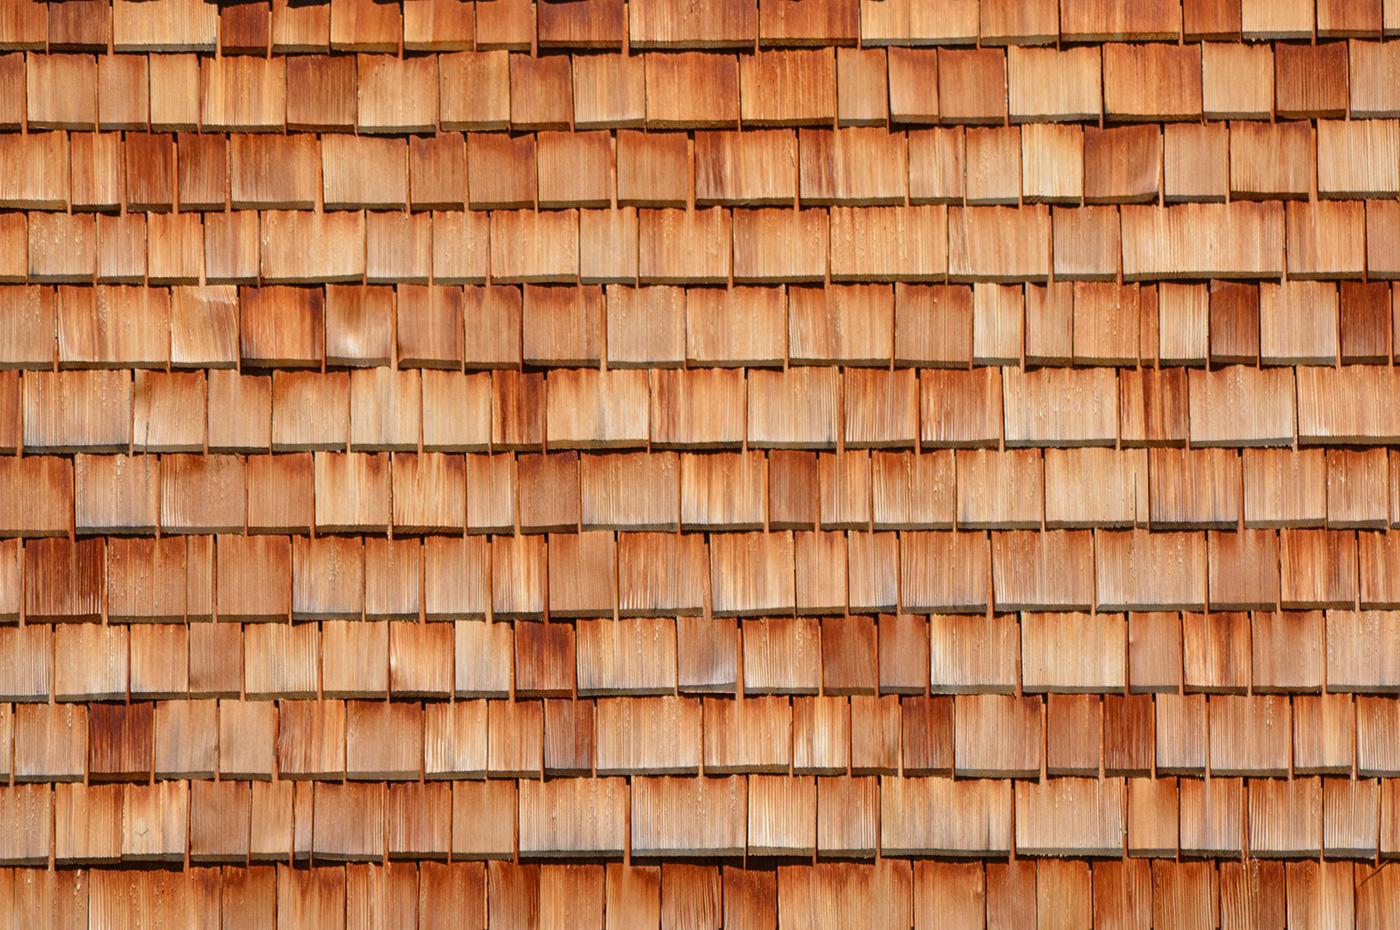 Schindelfassade-Zumkeller-Holz-Todtmoos